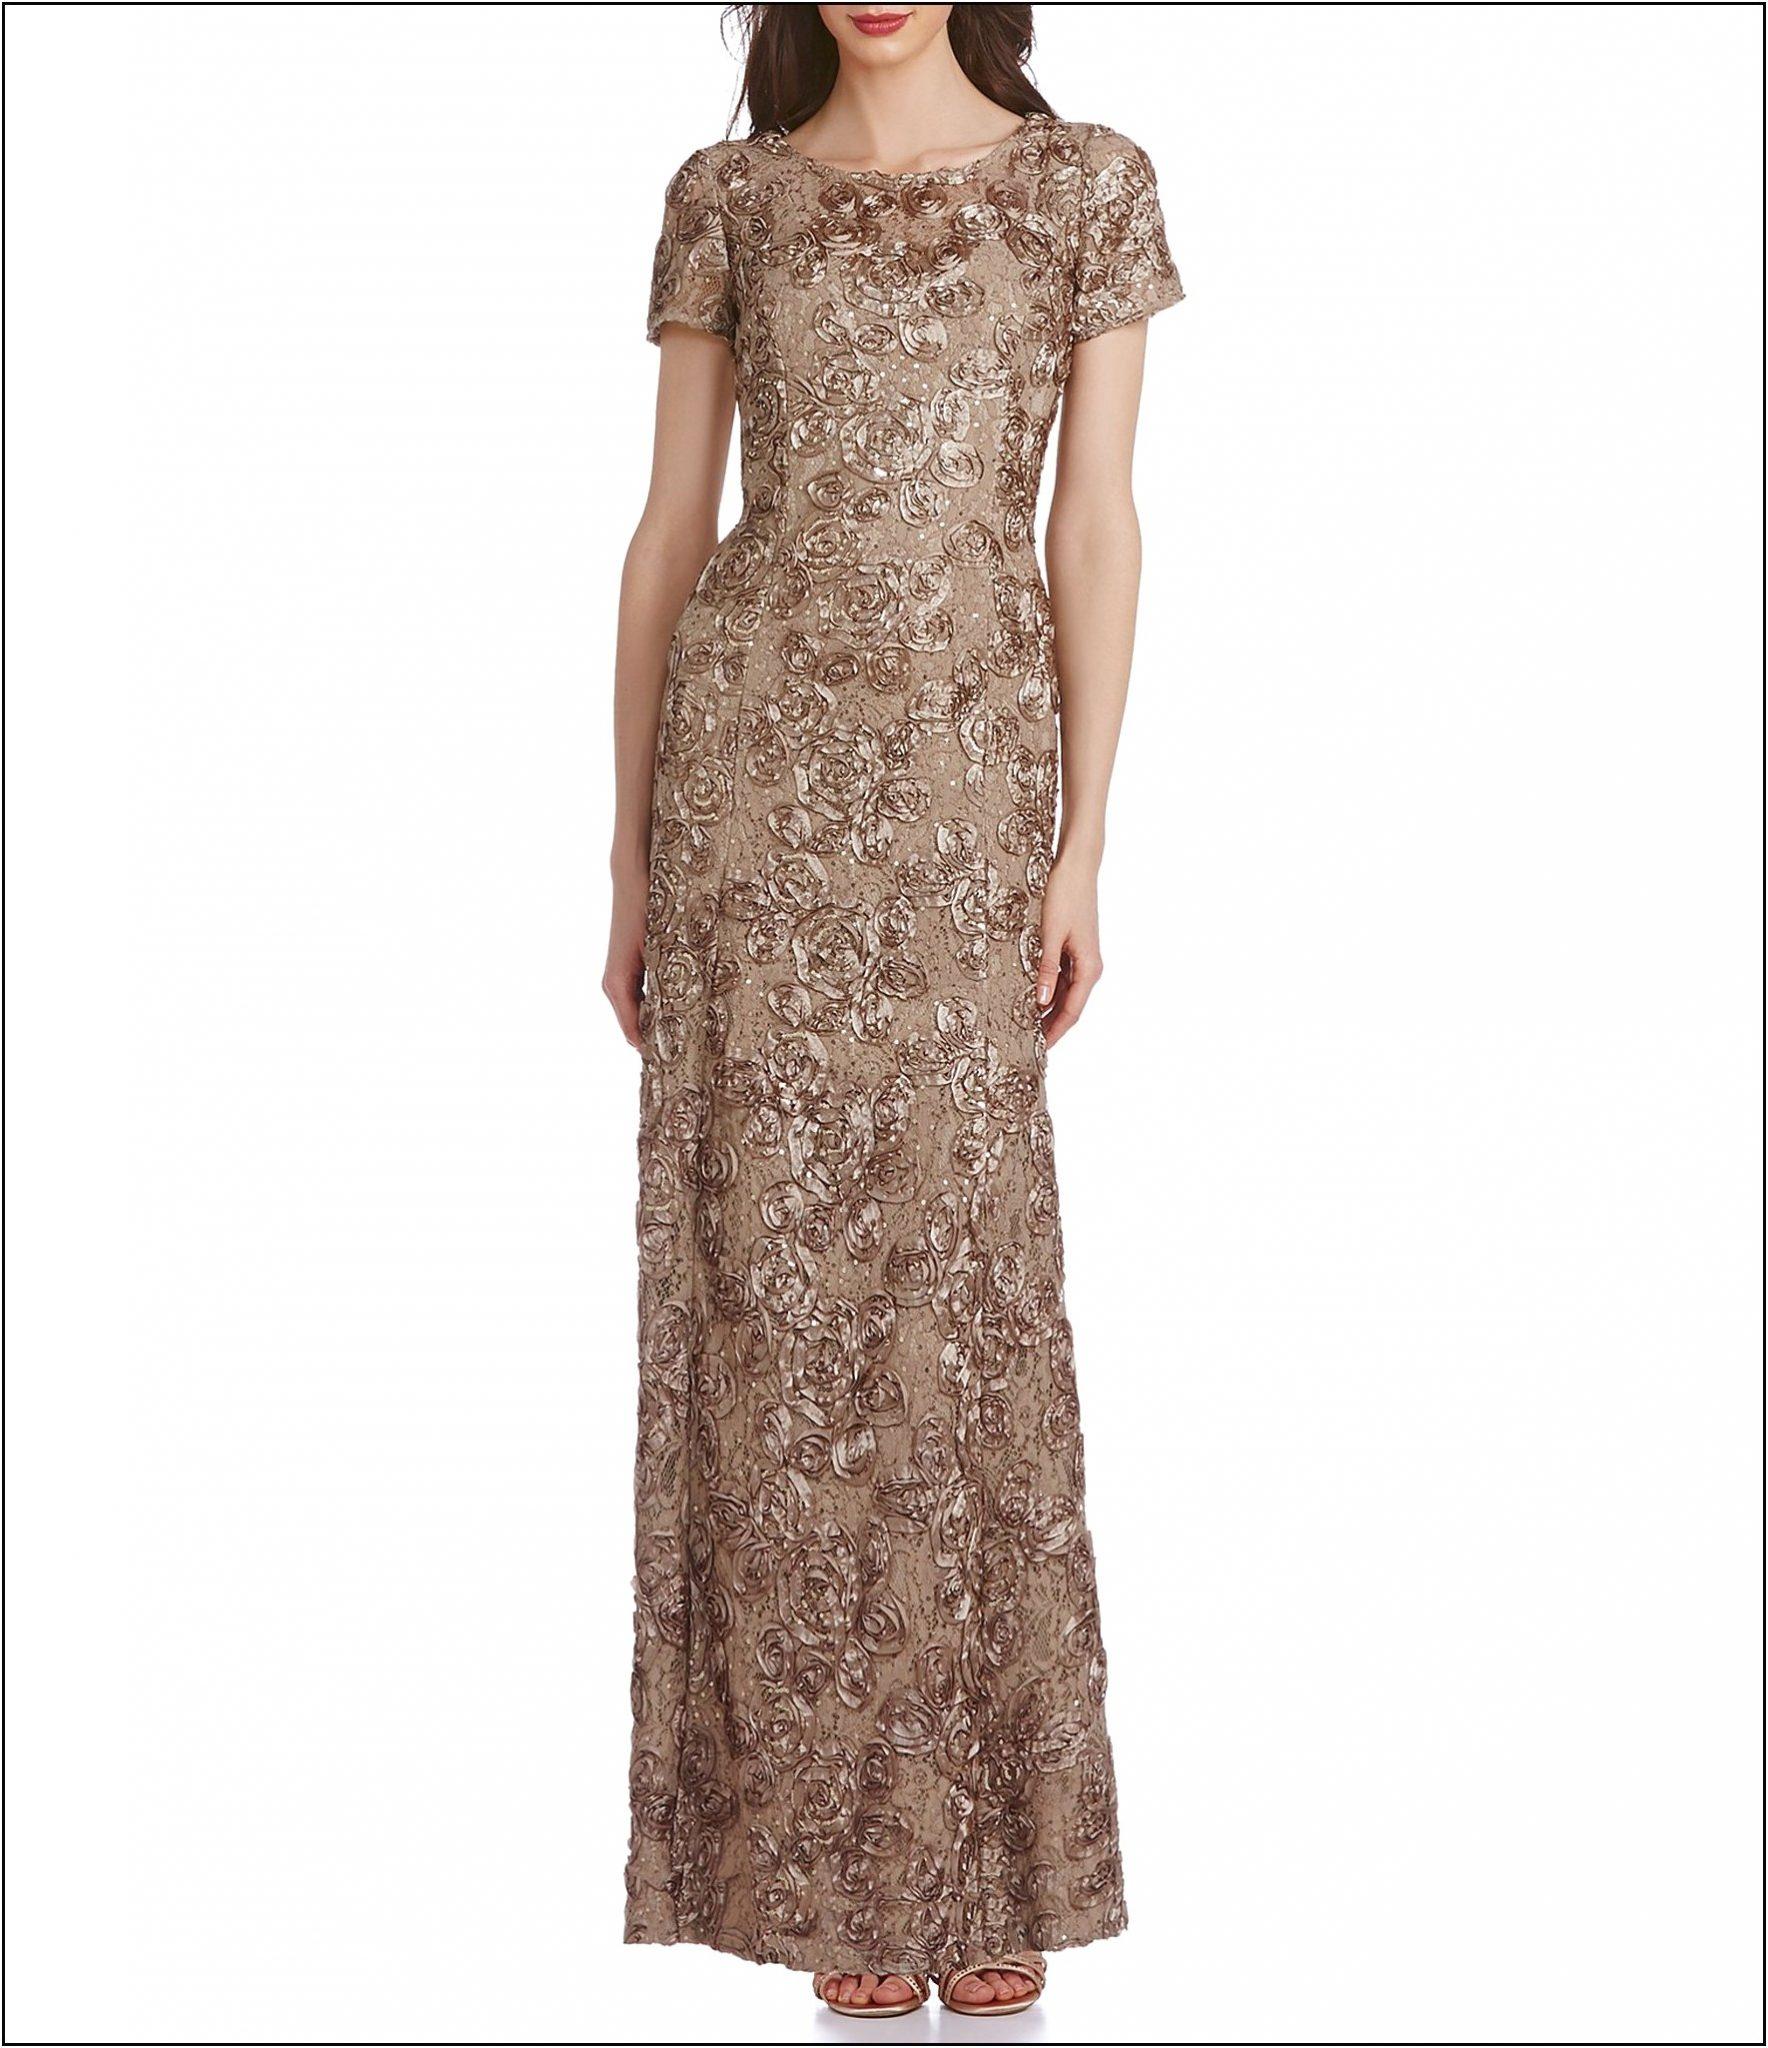 Dillards Mother of Bride Dresses Brown